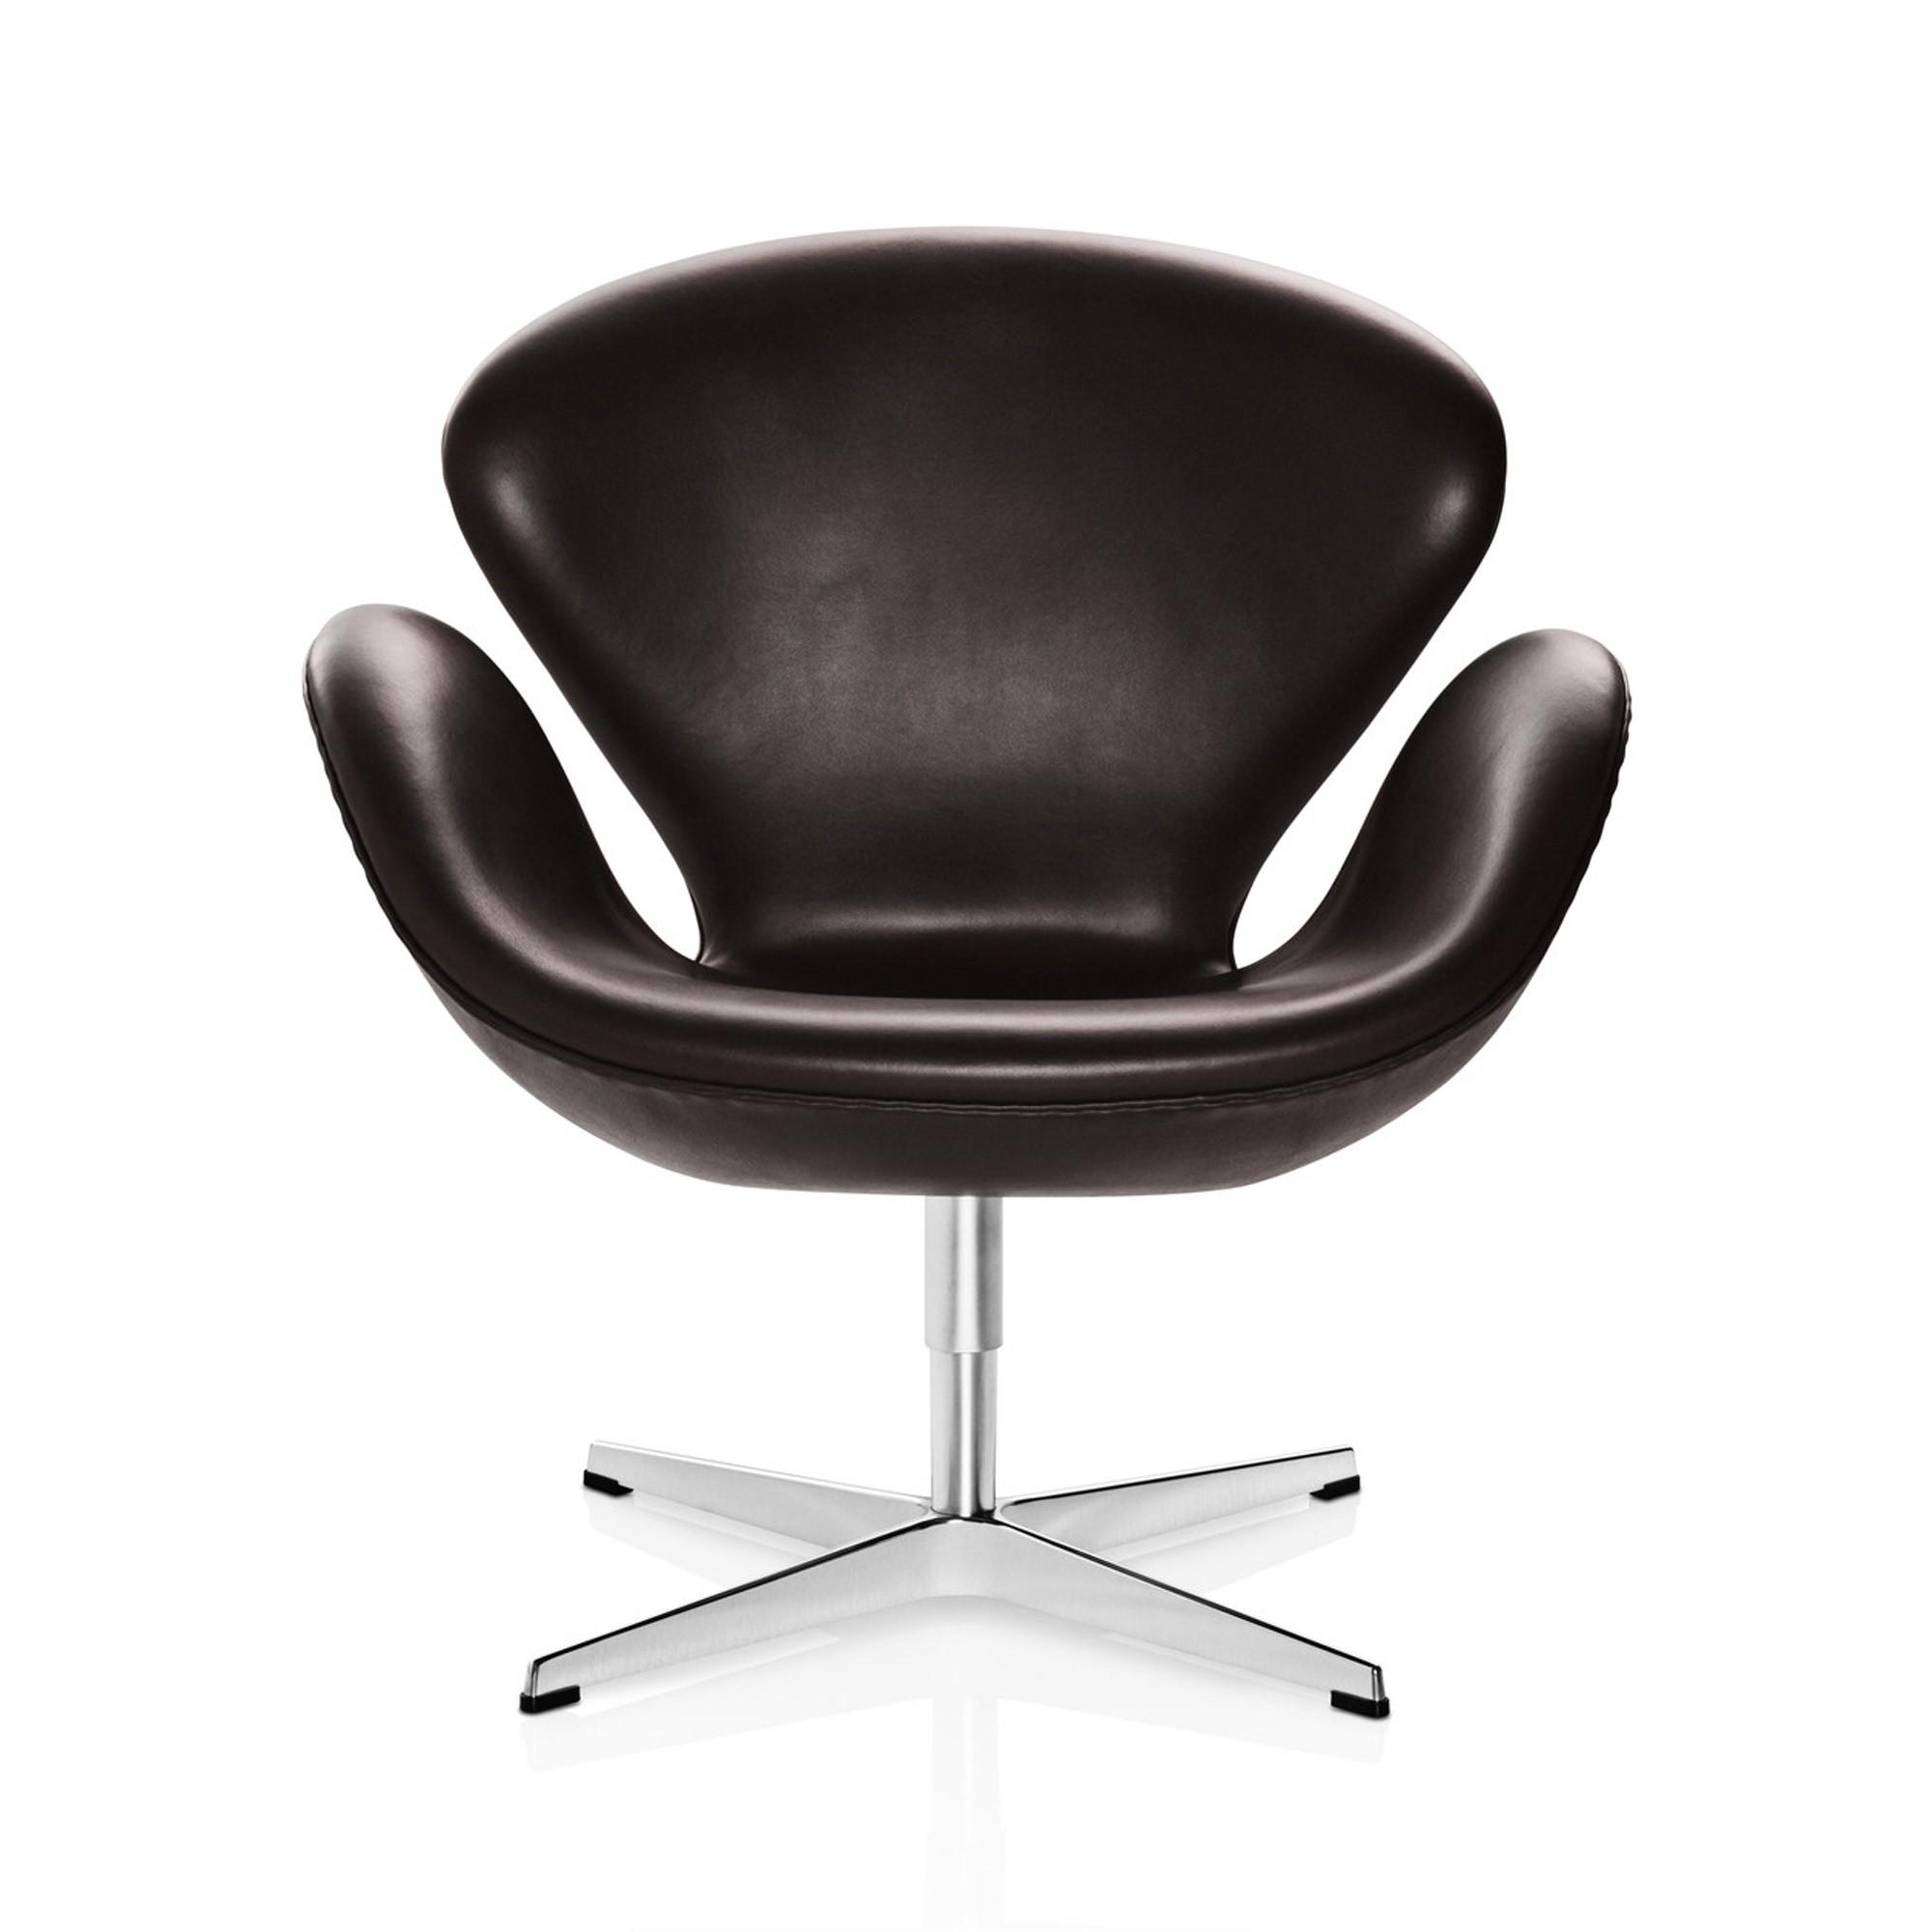 Icone di design sedie parte 1 casa di stile for Sedie icone design